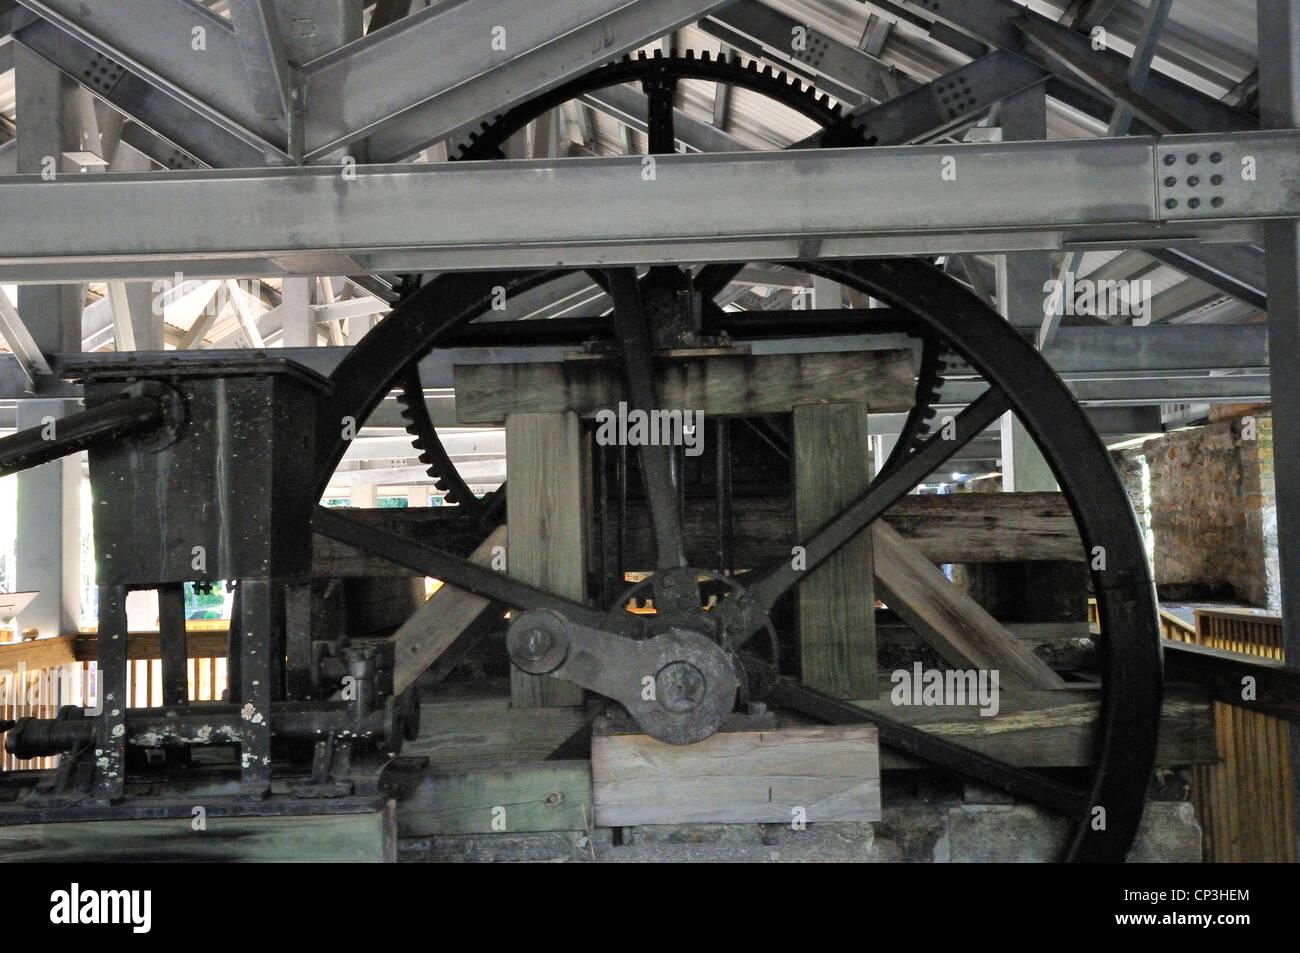 Machinery for sugar cane processing is displayed at the Dunlawton Sugar Mill Botanical Gardens in Port Orange, Florida - Stock Image